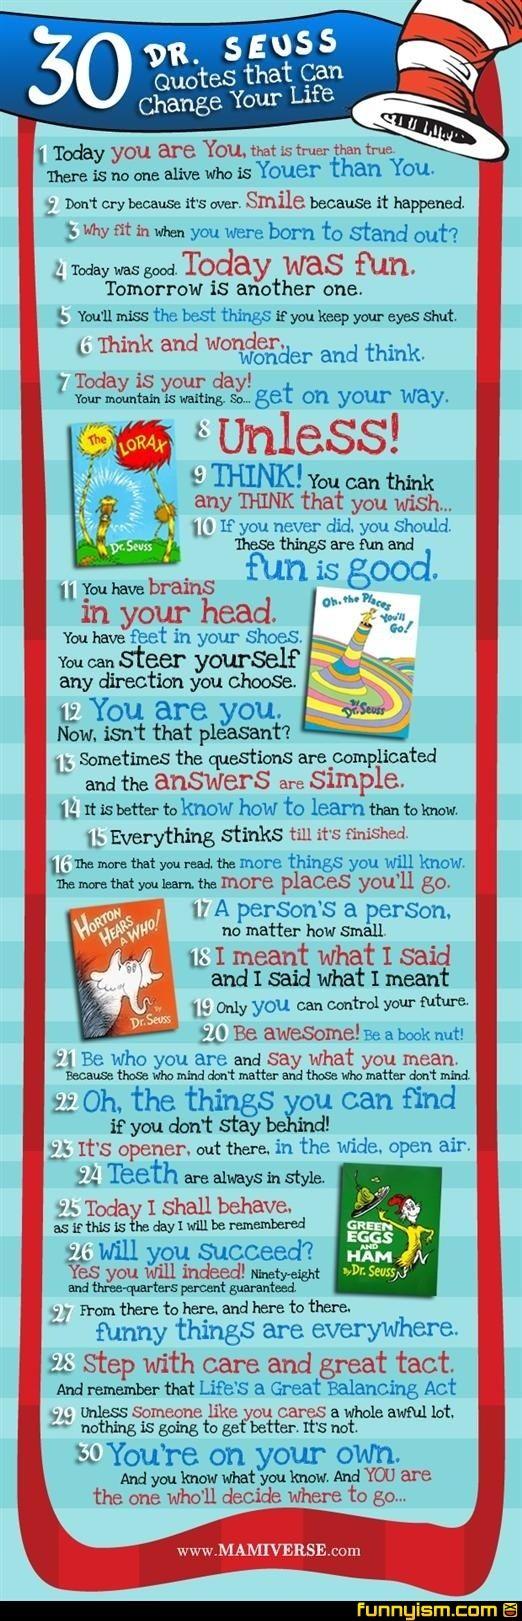 Dr Seuss on Pinterest